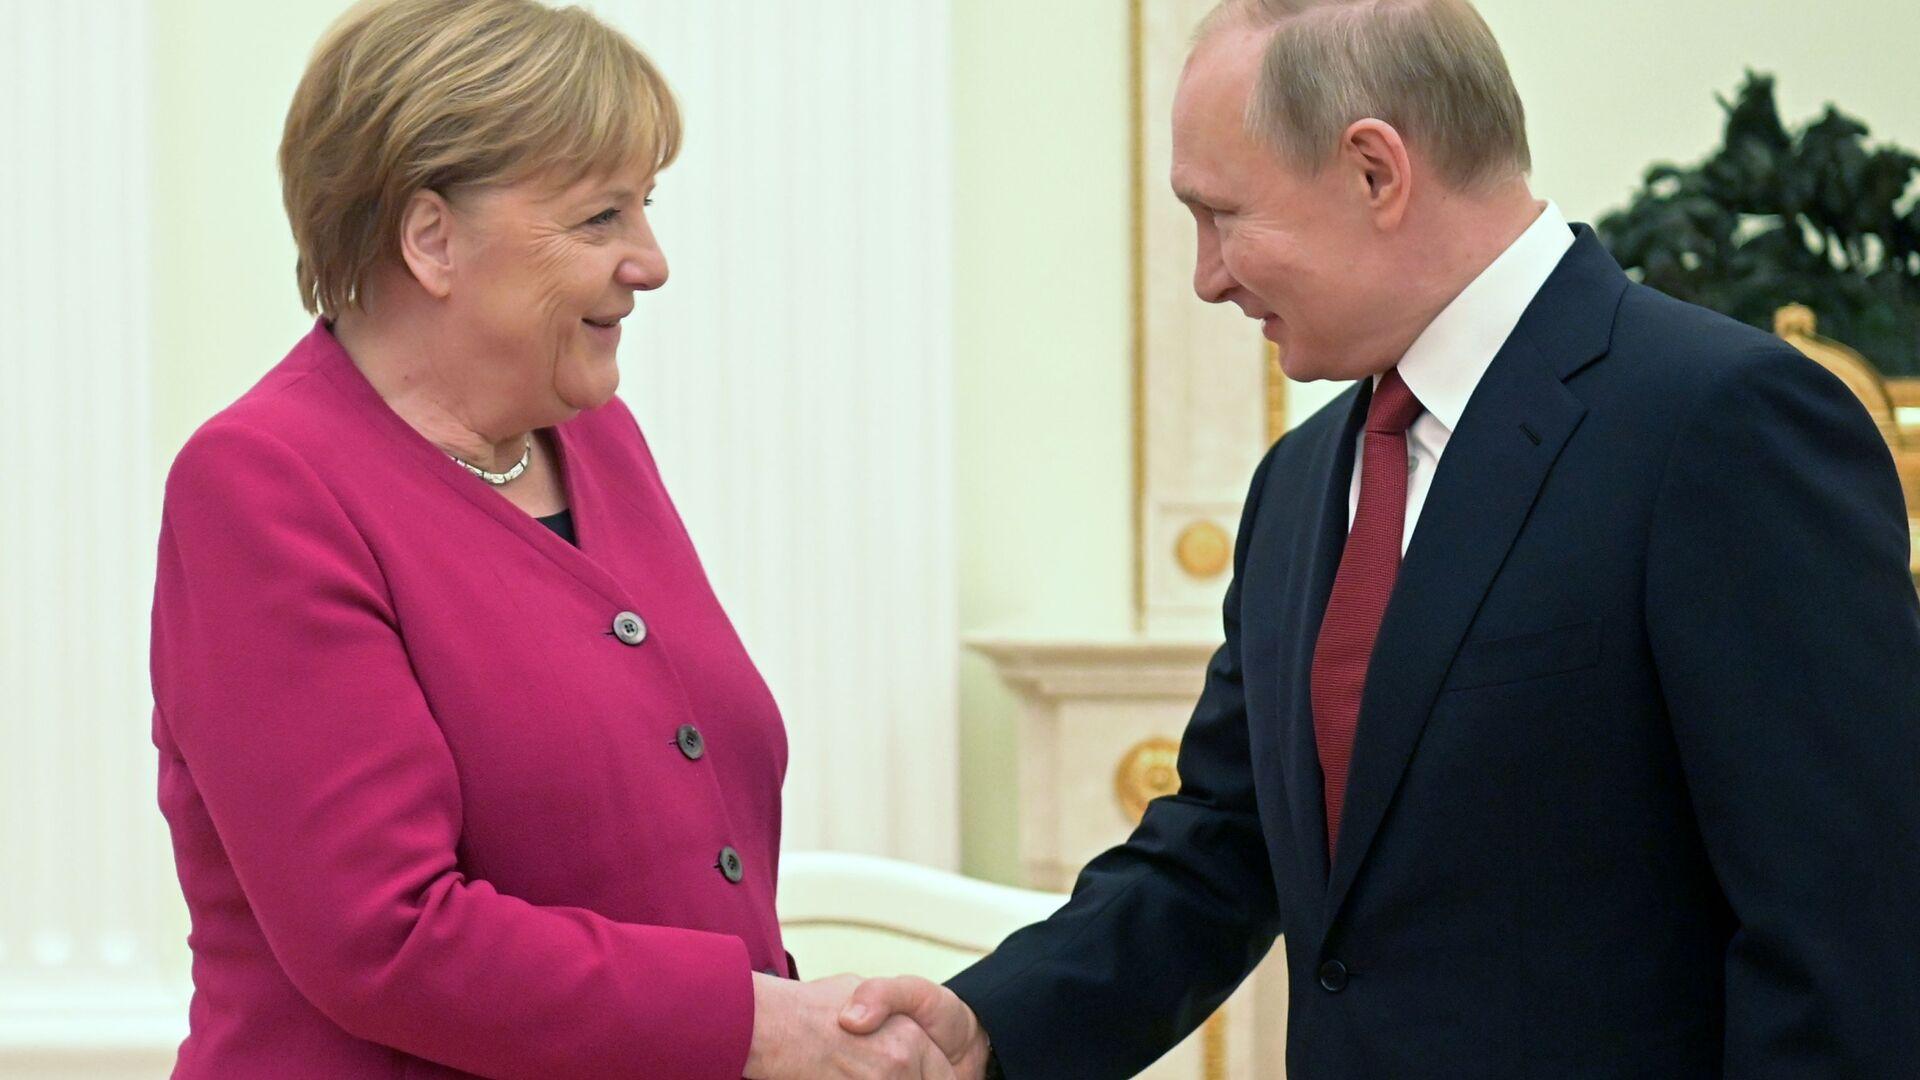 Il presidente russo Vladimir Putin e la cancelliera tedesca Angela Merkel l'11 gennaio 2020 - Sputnik Italia, 1920, 22.06.2021